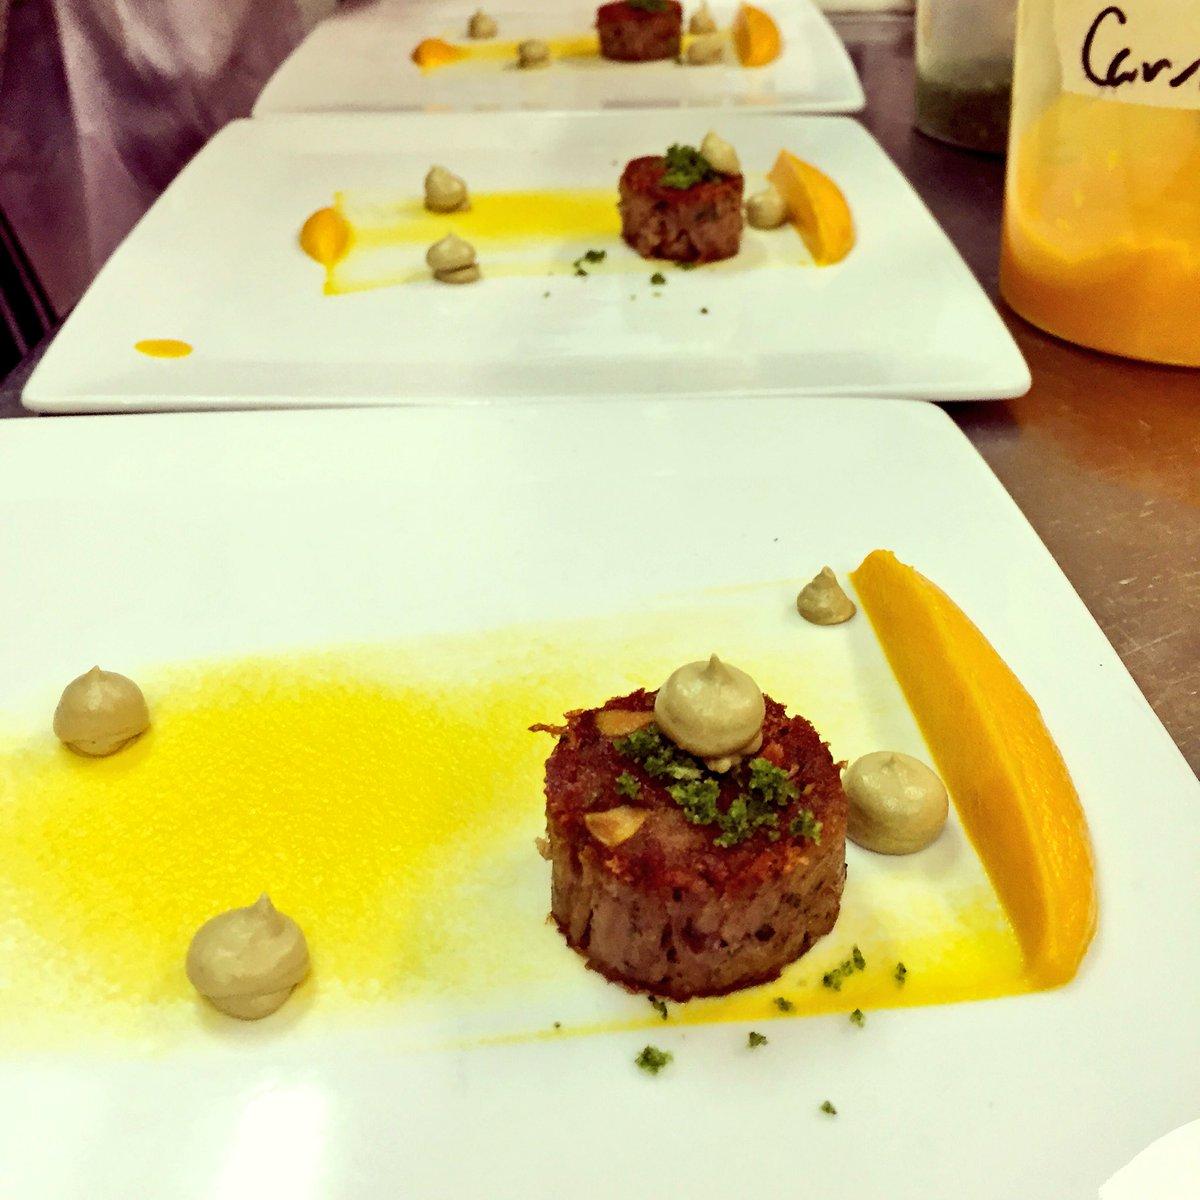 Farmhaus Restaurant on Twitter: